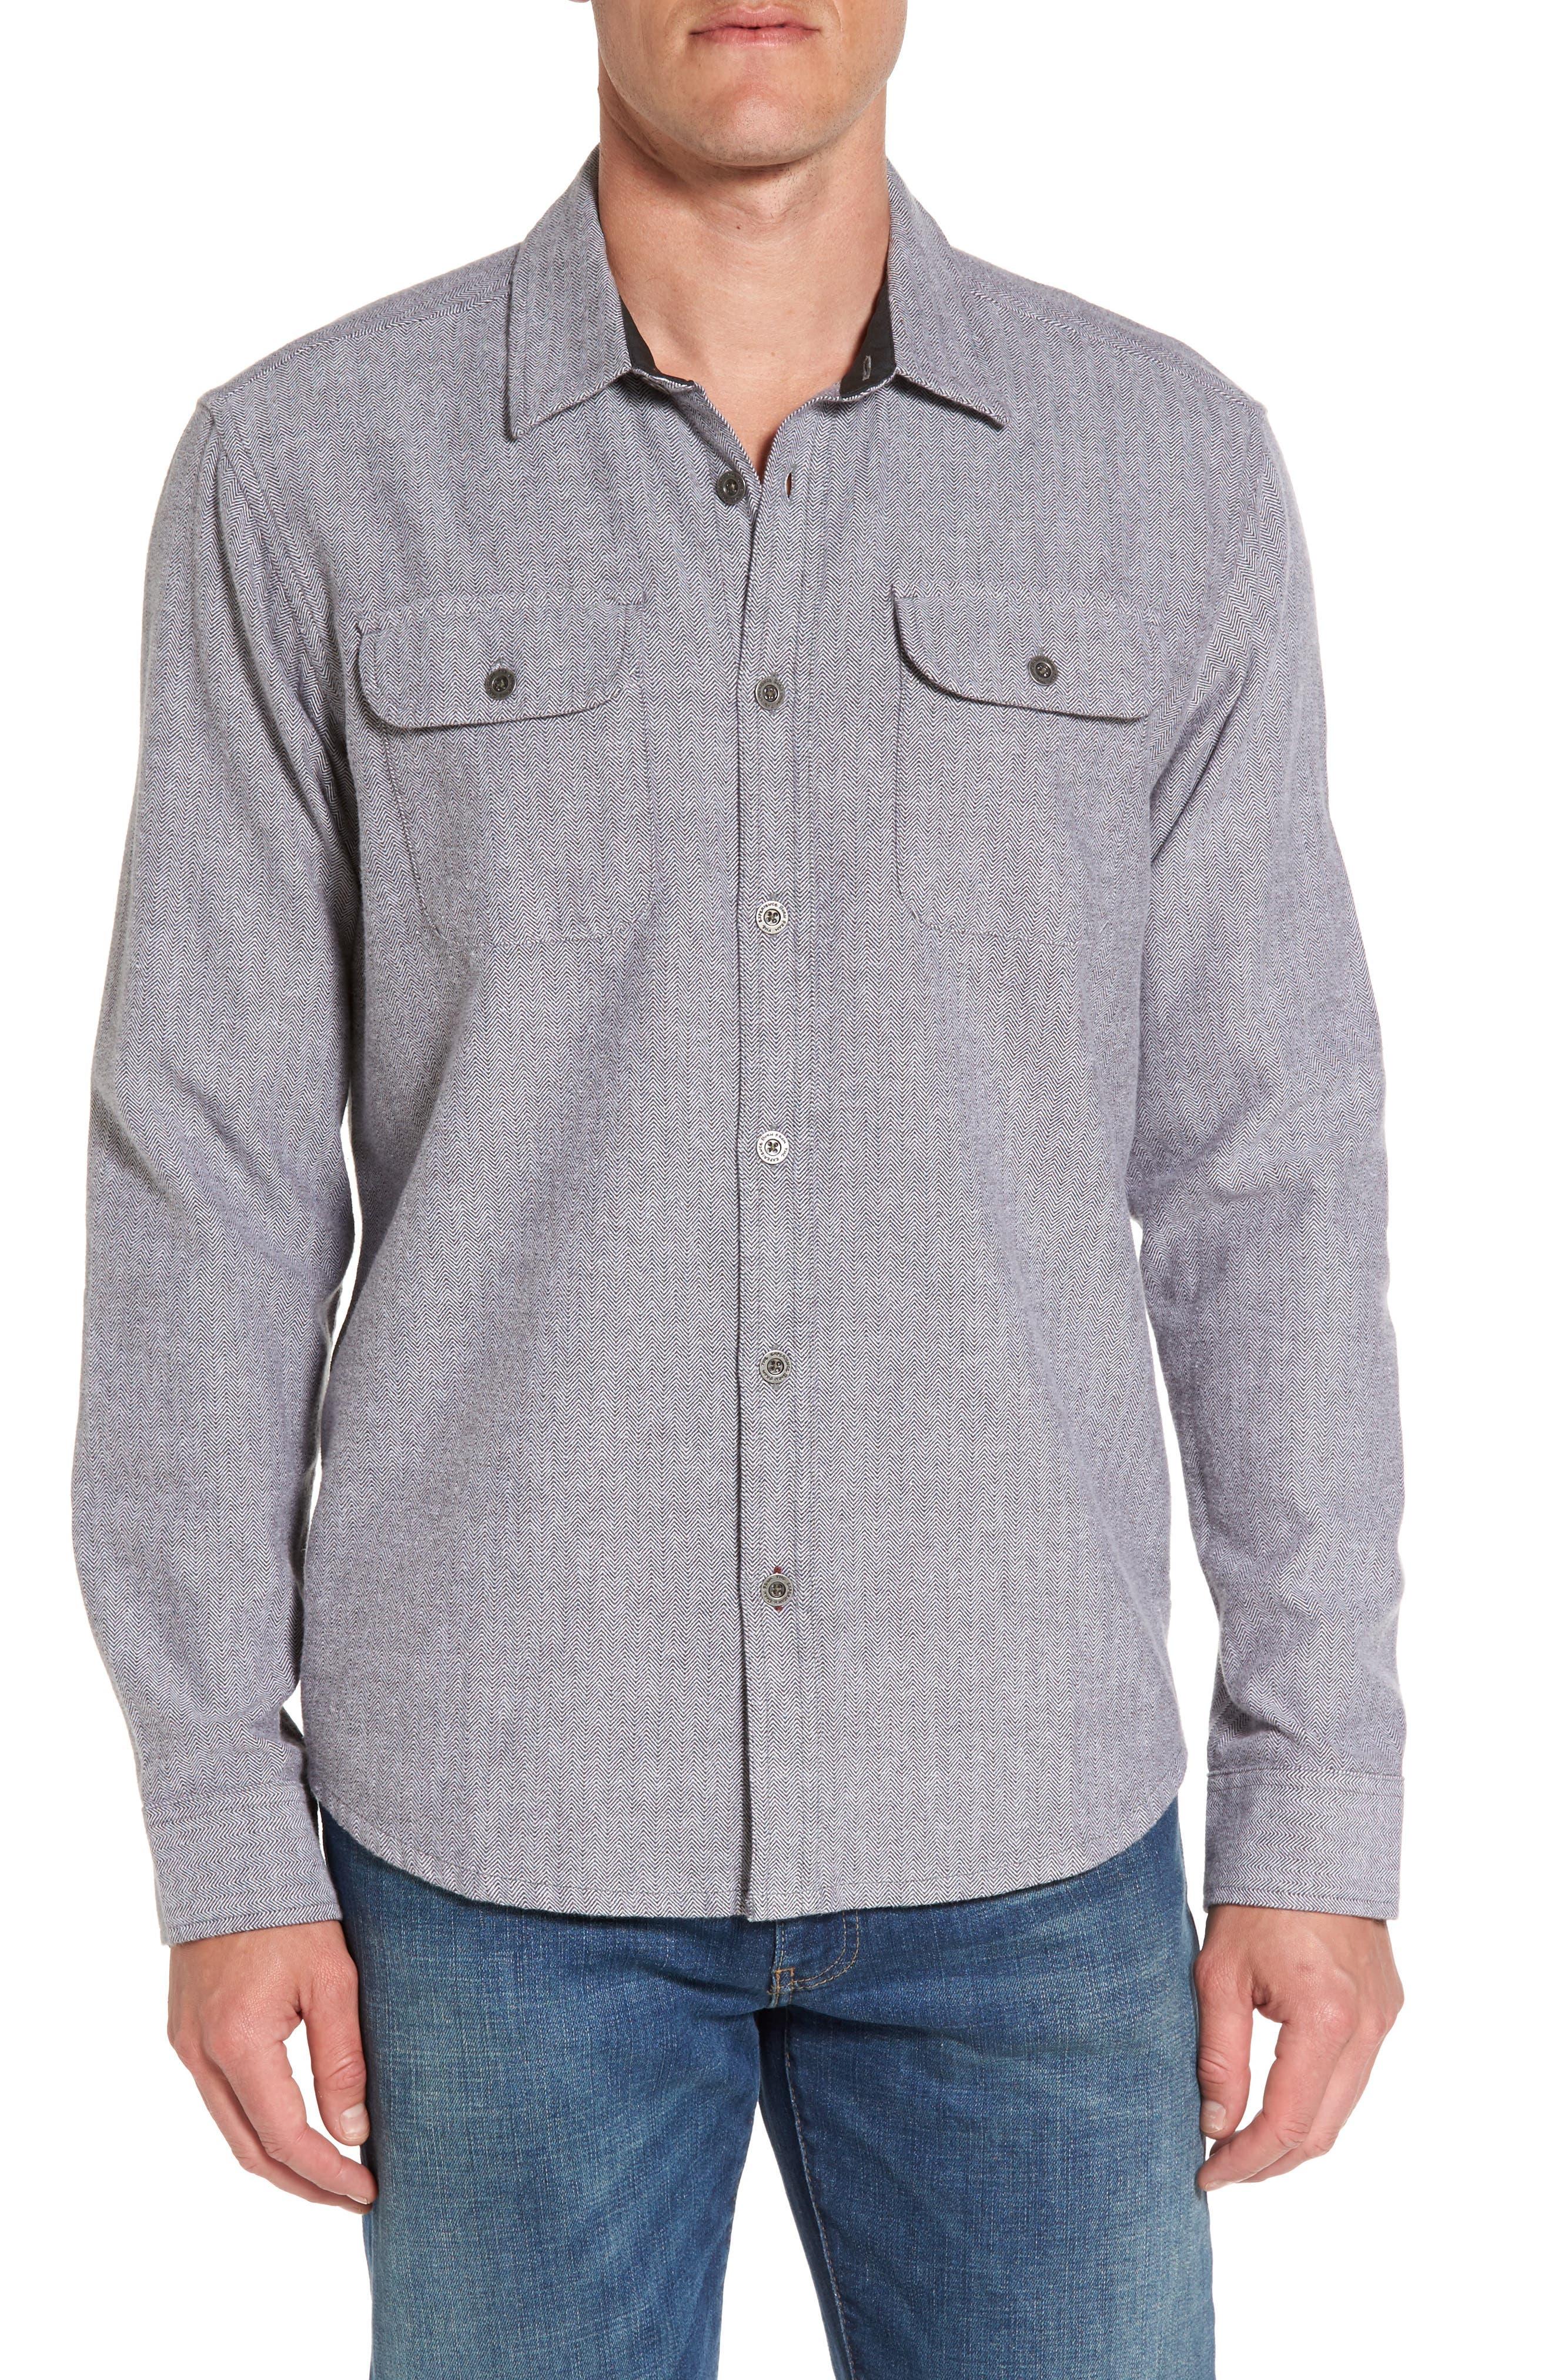 Lybek Regular Fit Herringbone Flannel Shirt,                         Main,                         color, Gravel